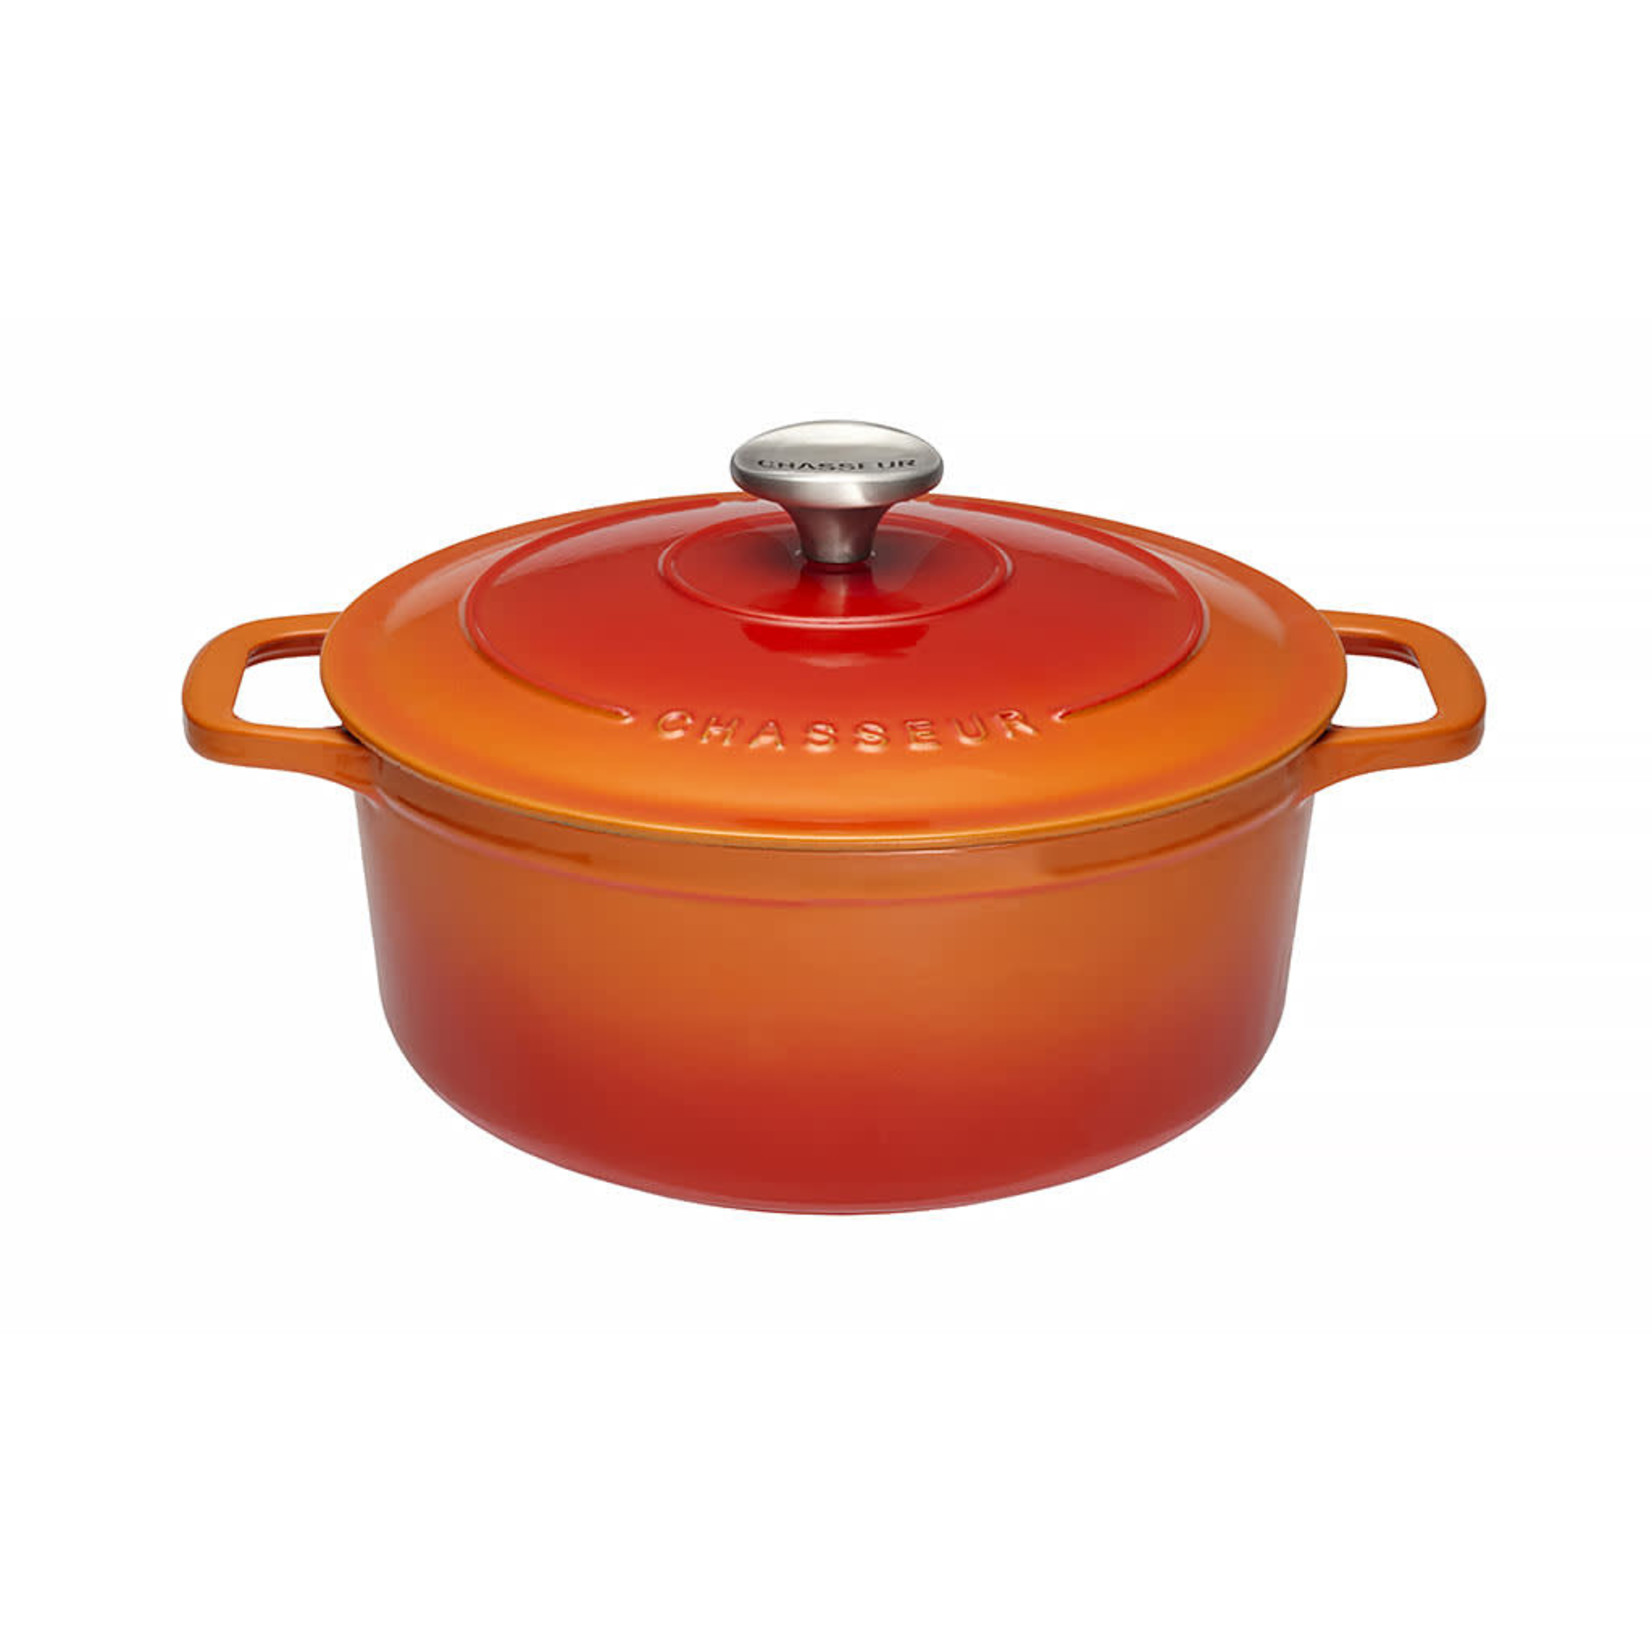 Chasseur Cocotte rond 20cm 2,5L oranje